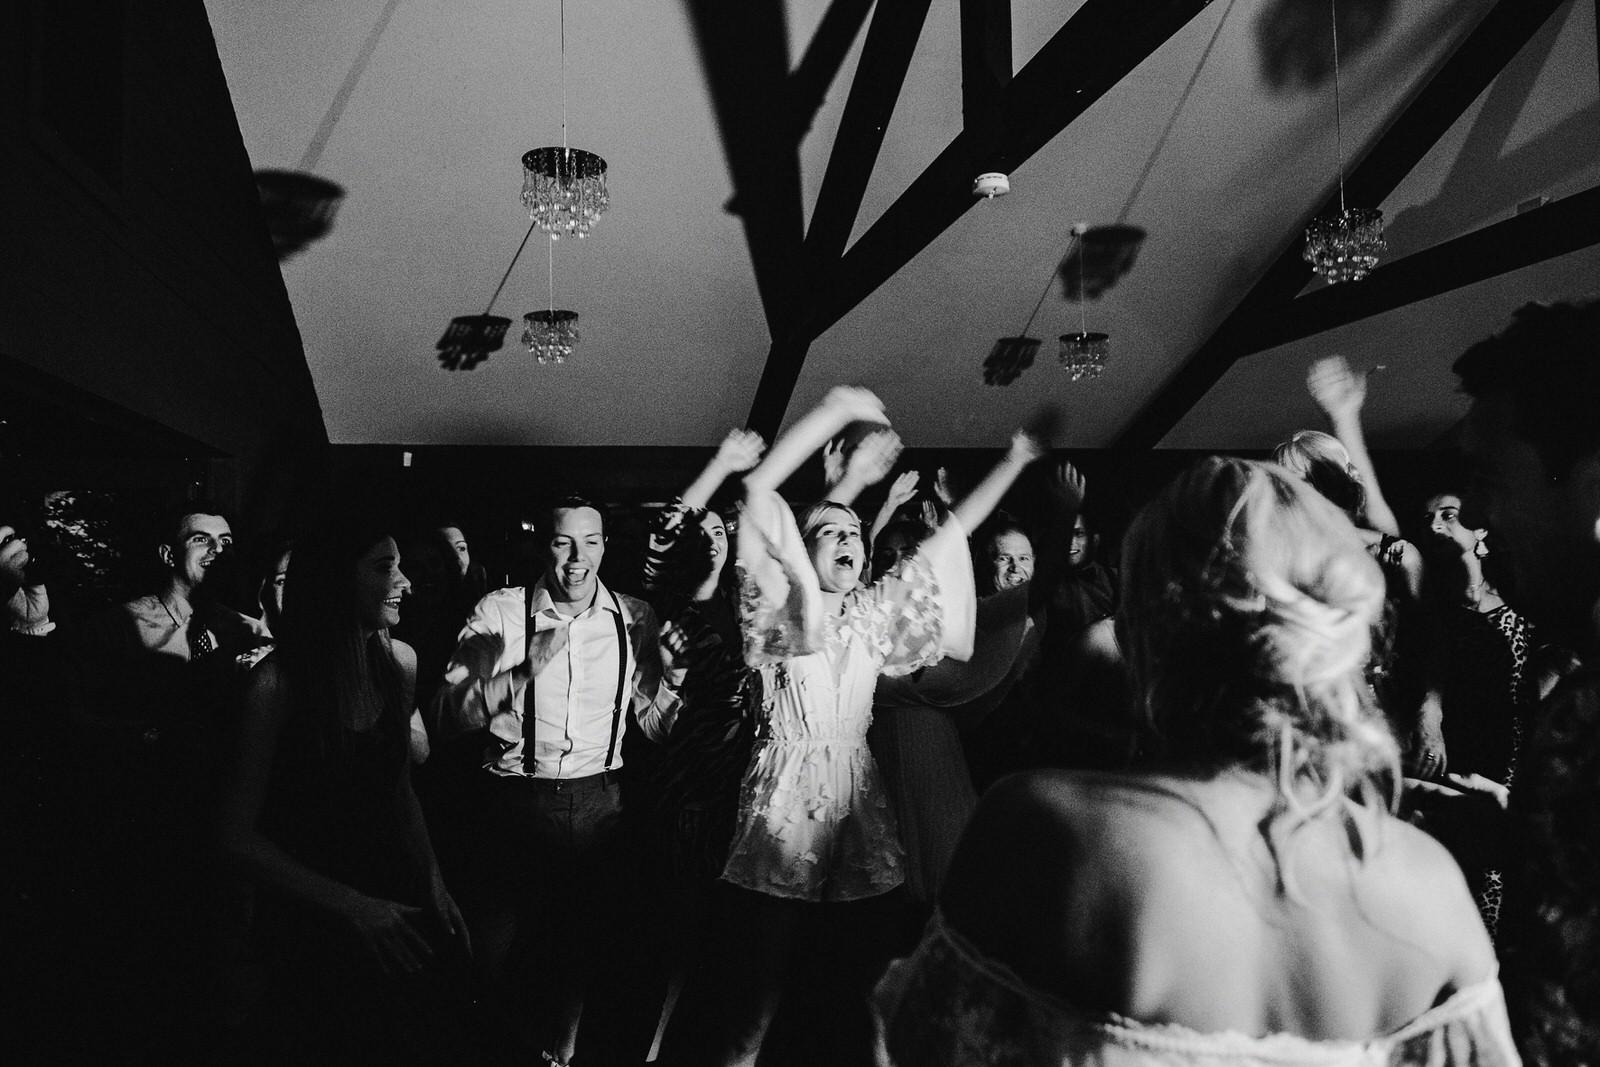 Wairarapa-Wedding_The-Landing_004.JPG